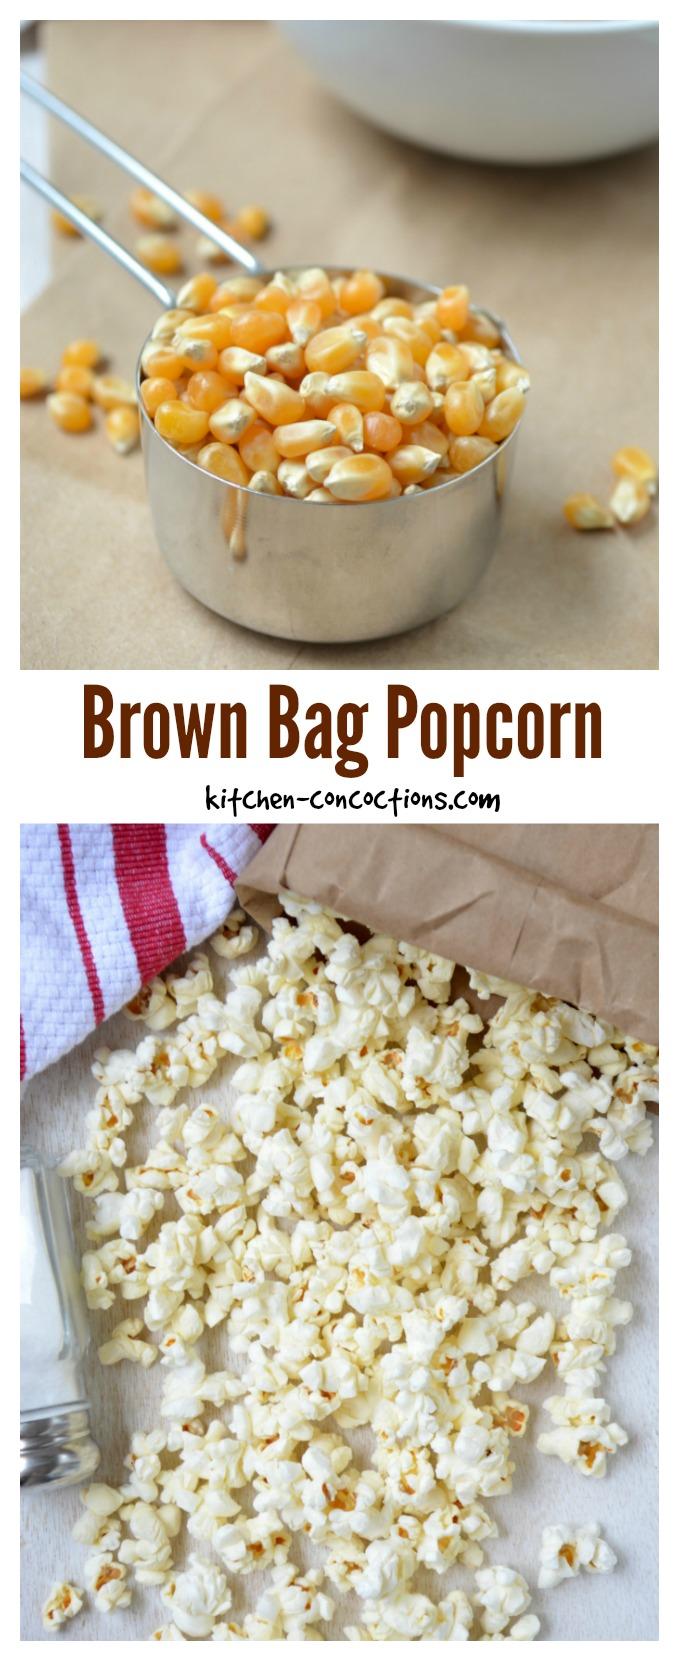 Brown Bag Microwave Popcorn Kitchen Concoctions